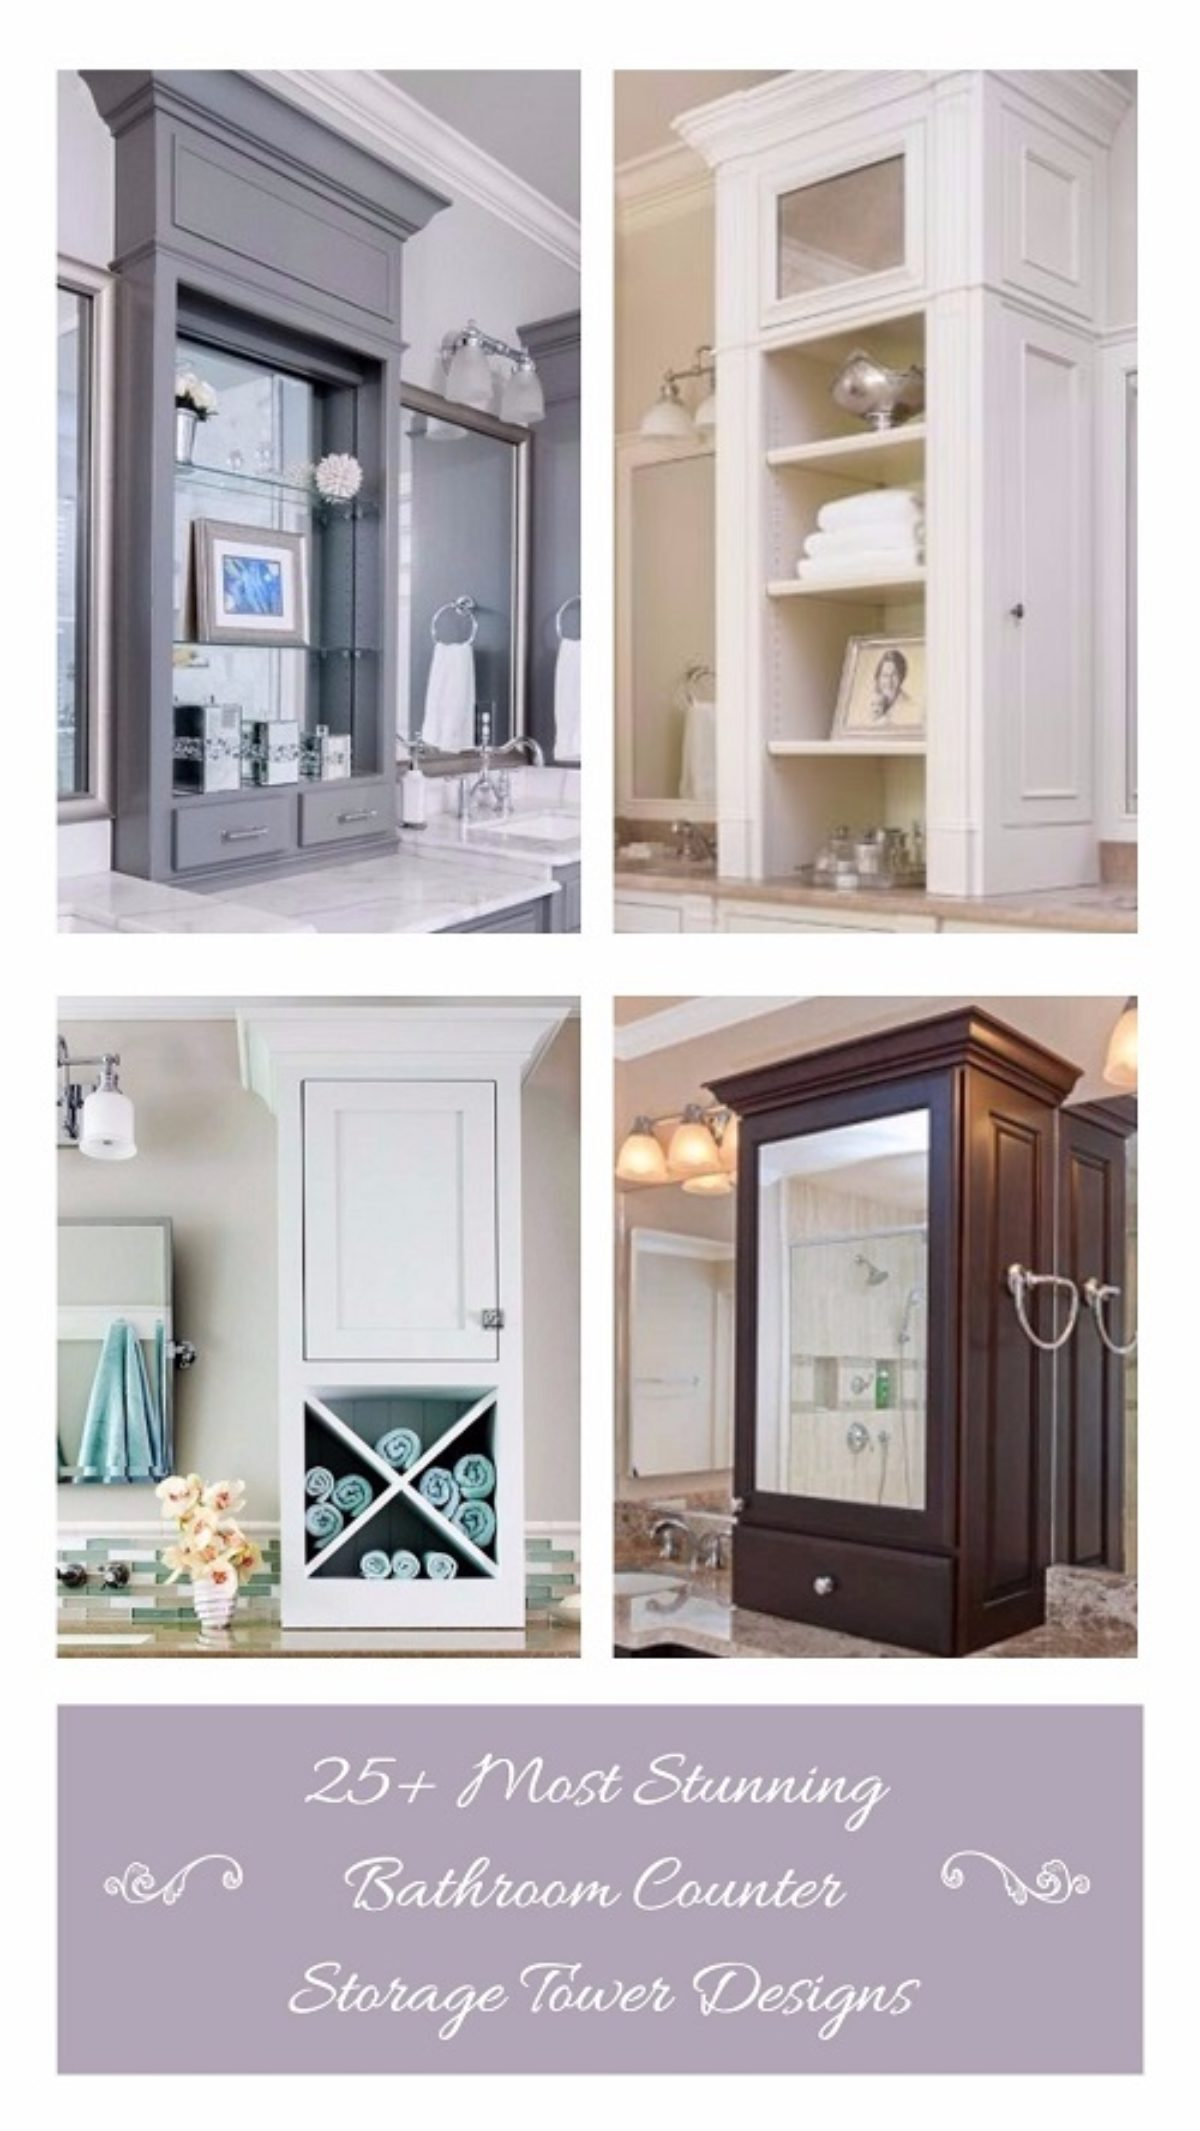 25 Most Stunning Bathroom Counter Storage Tower Designs Inspiration